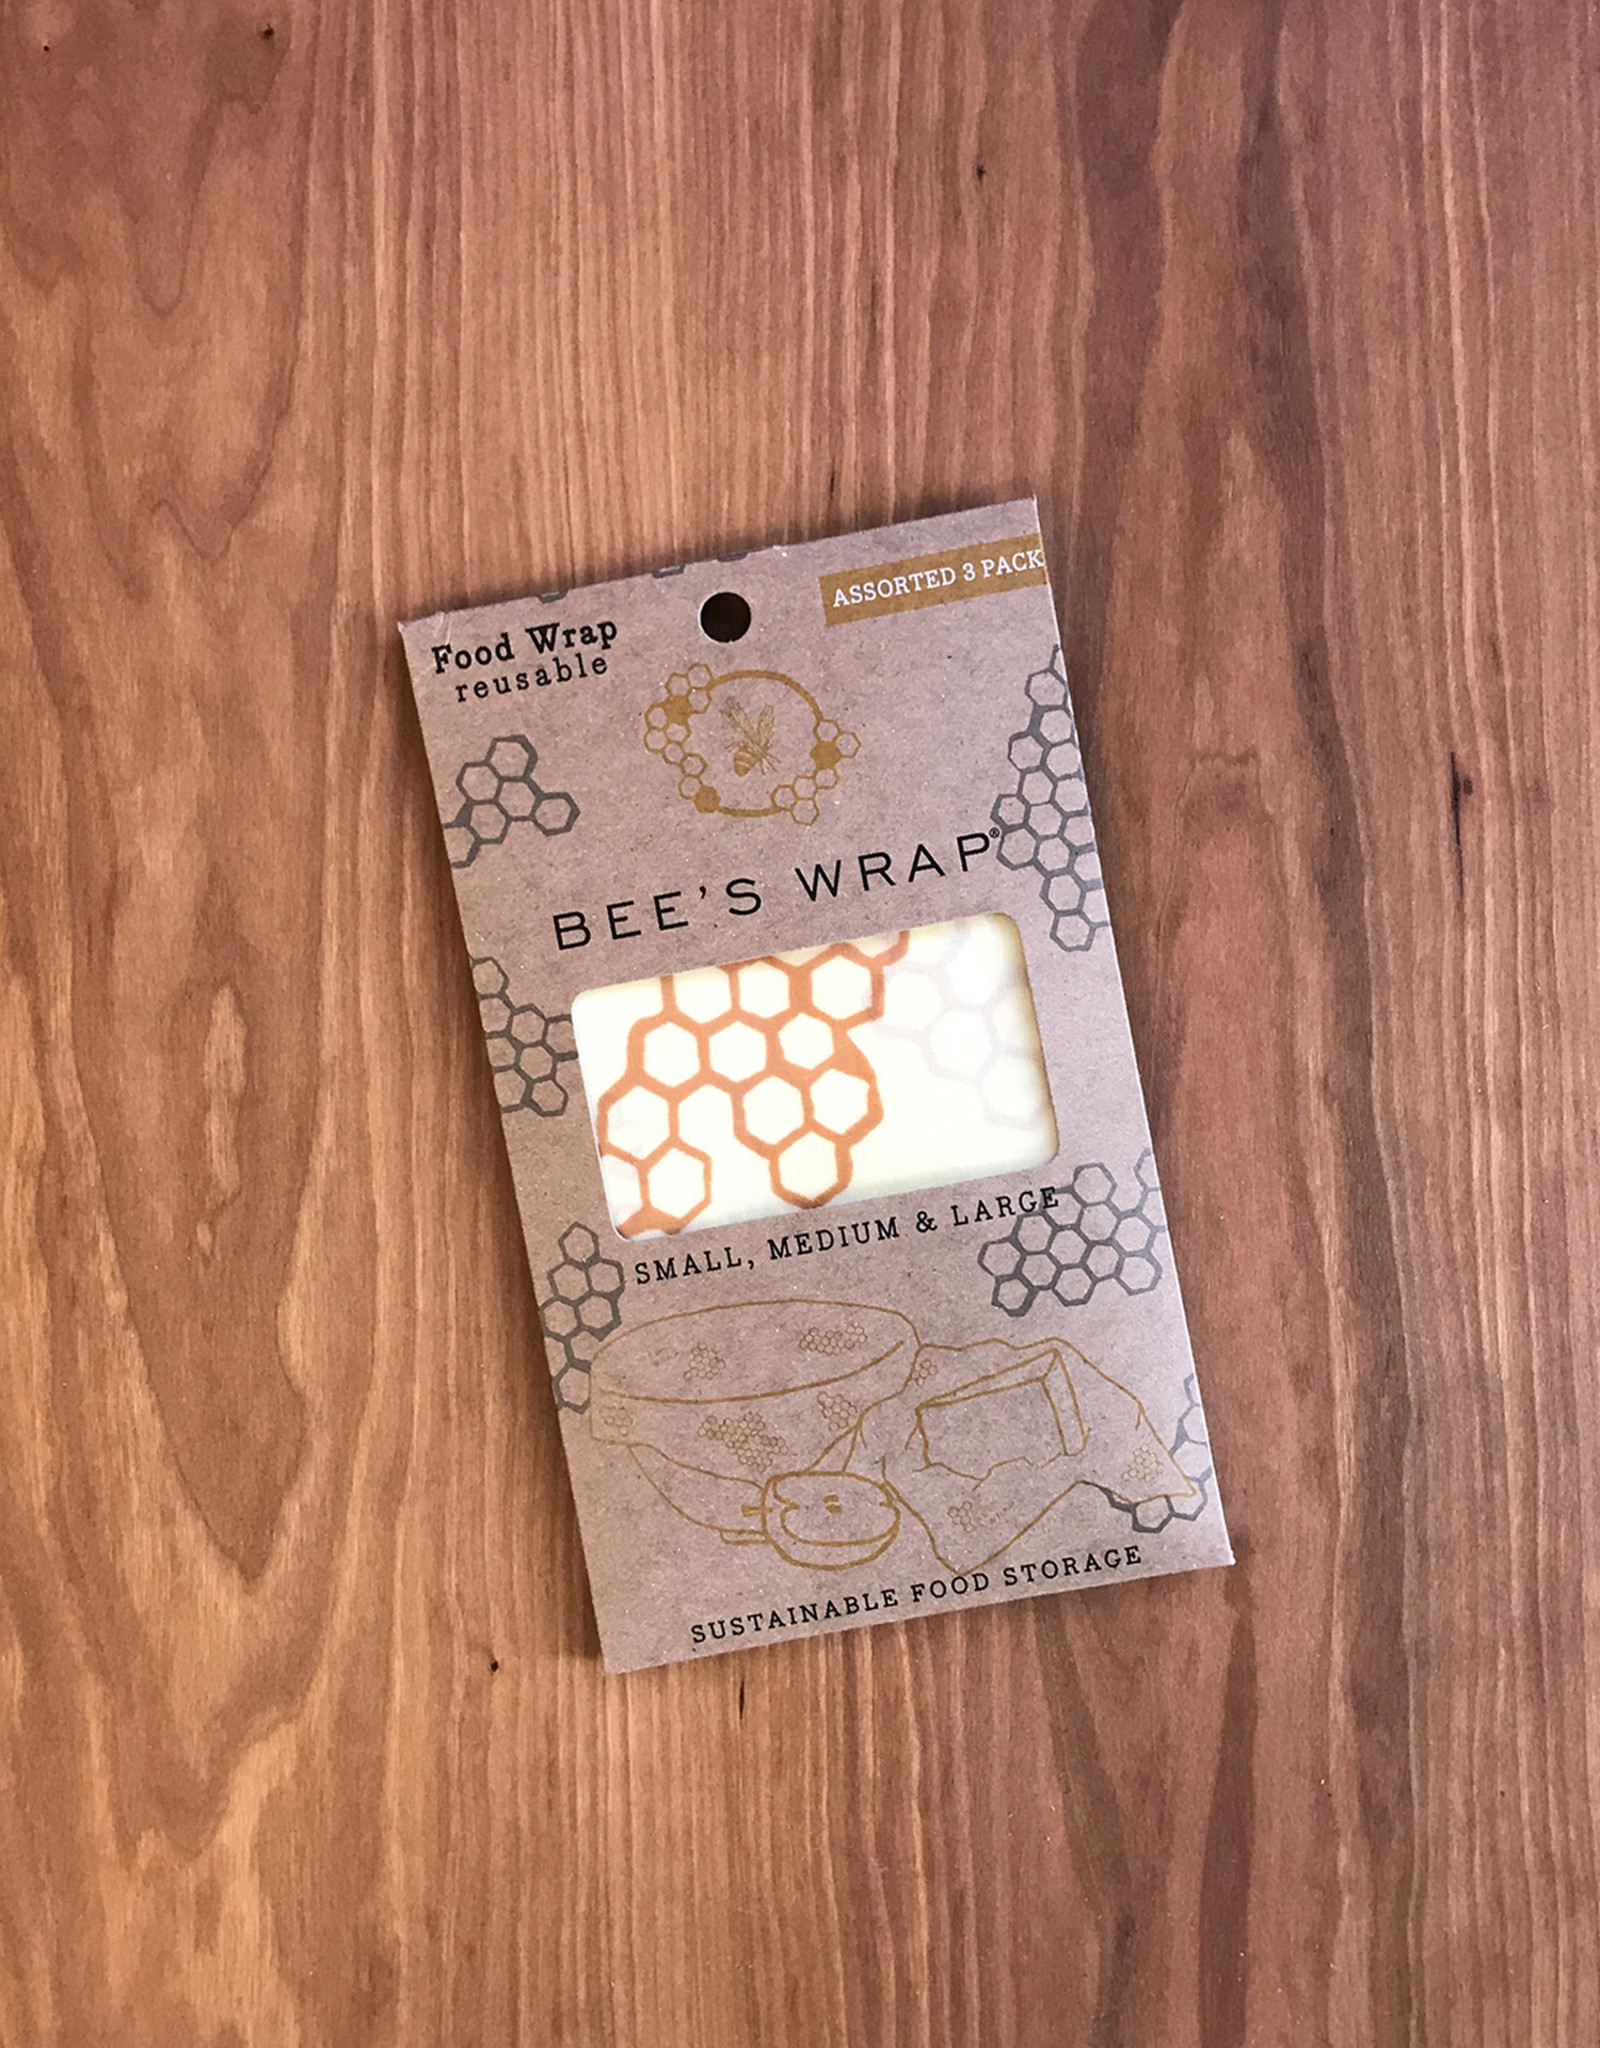 Bee's Wrap Bee's Wrap